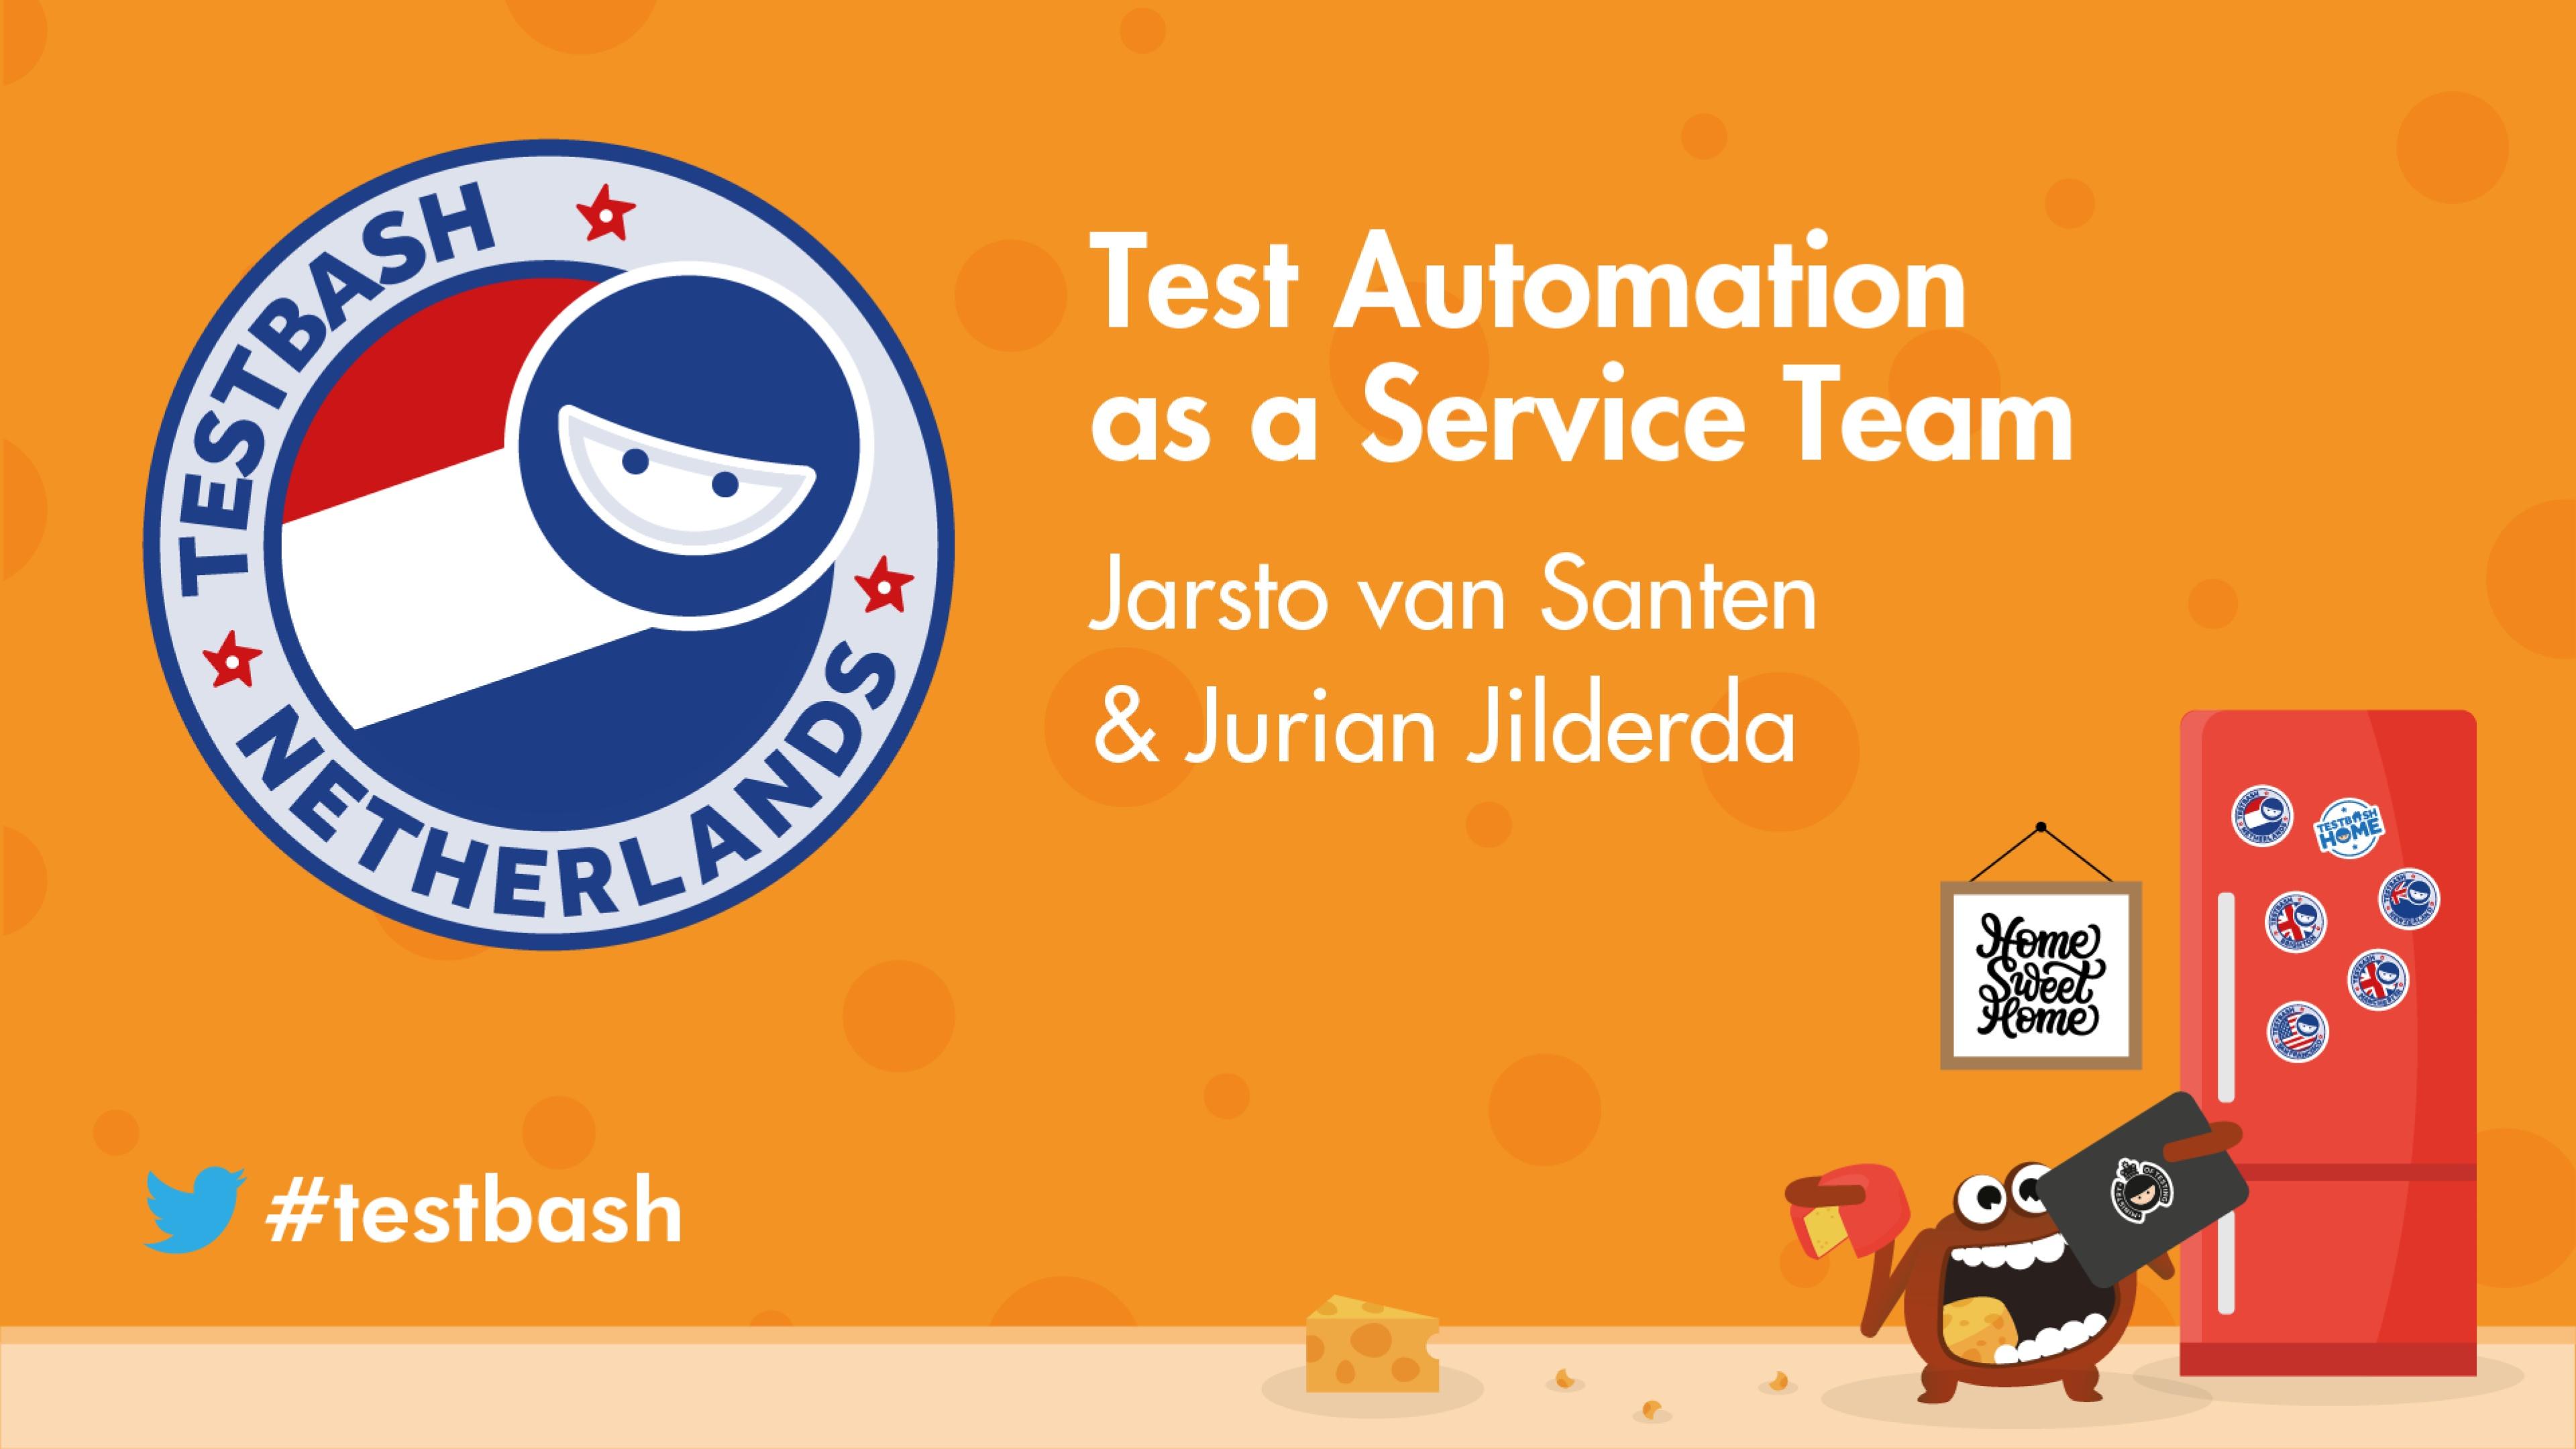 Test Automation as a Service Team - Jurian Jilderda & Jarsto van Santen